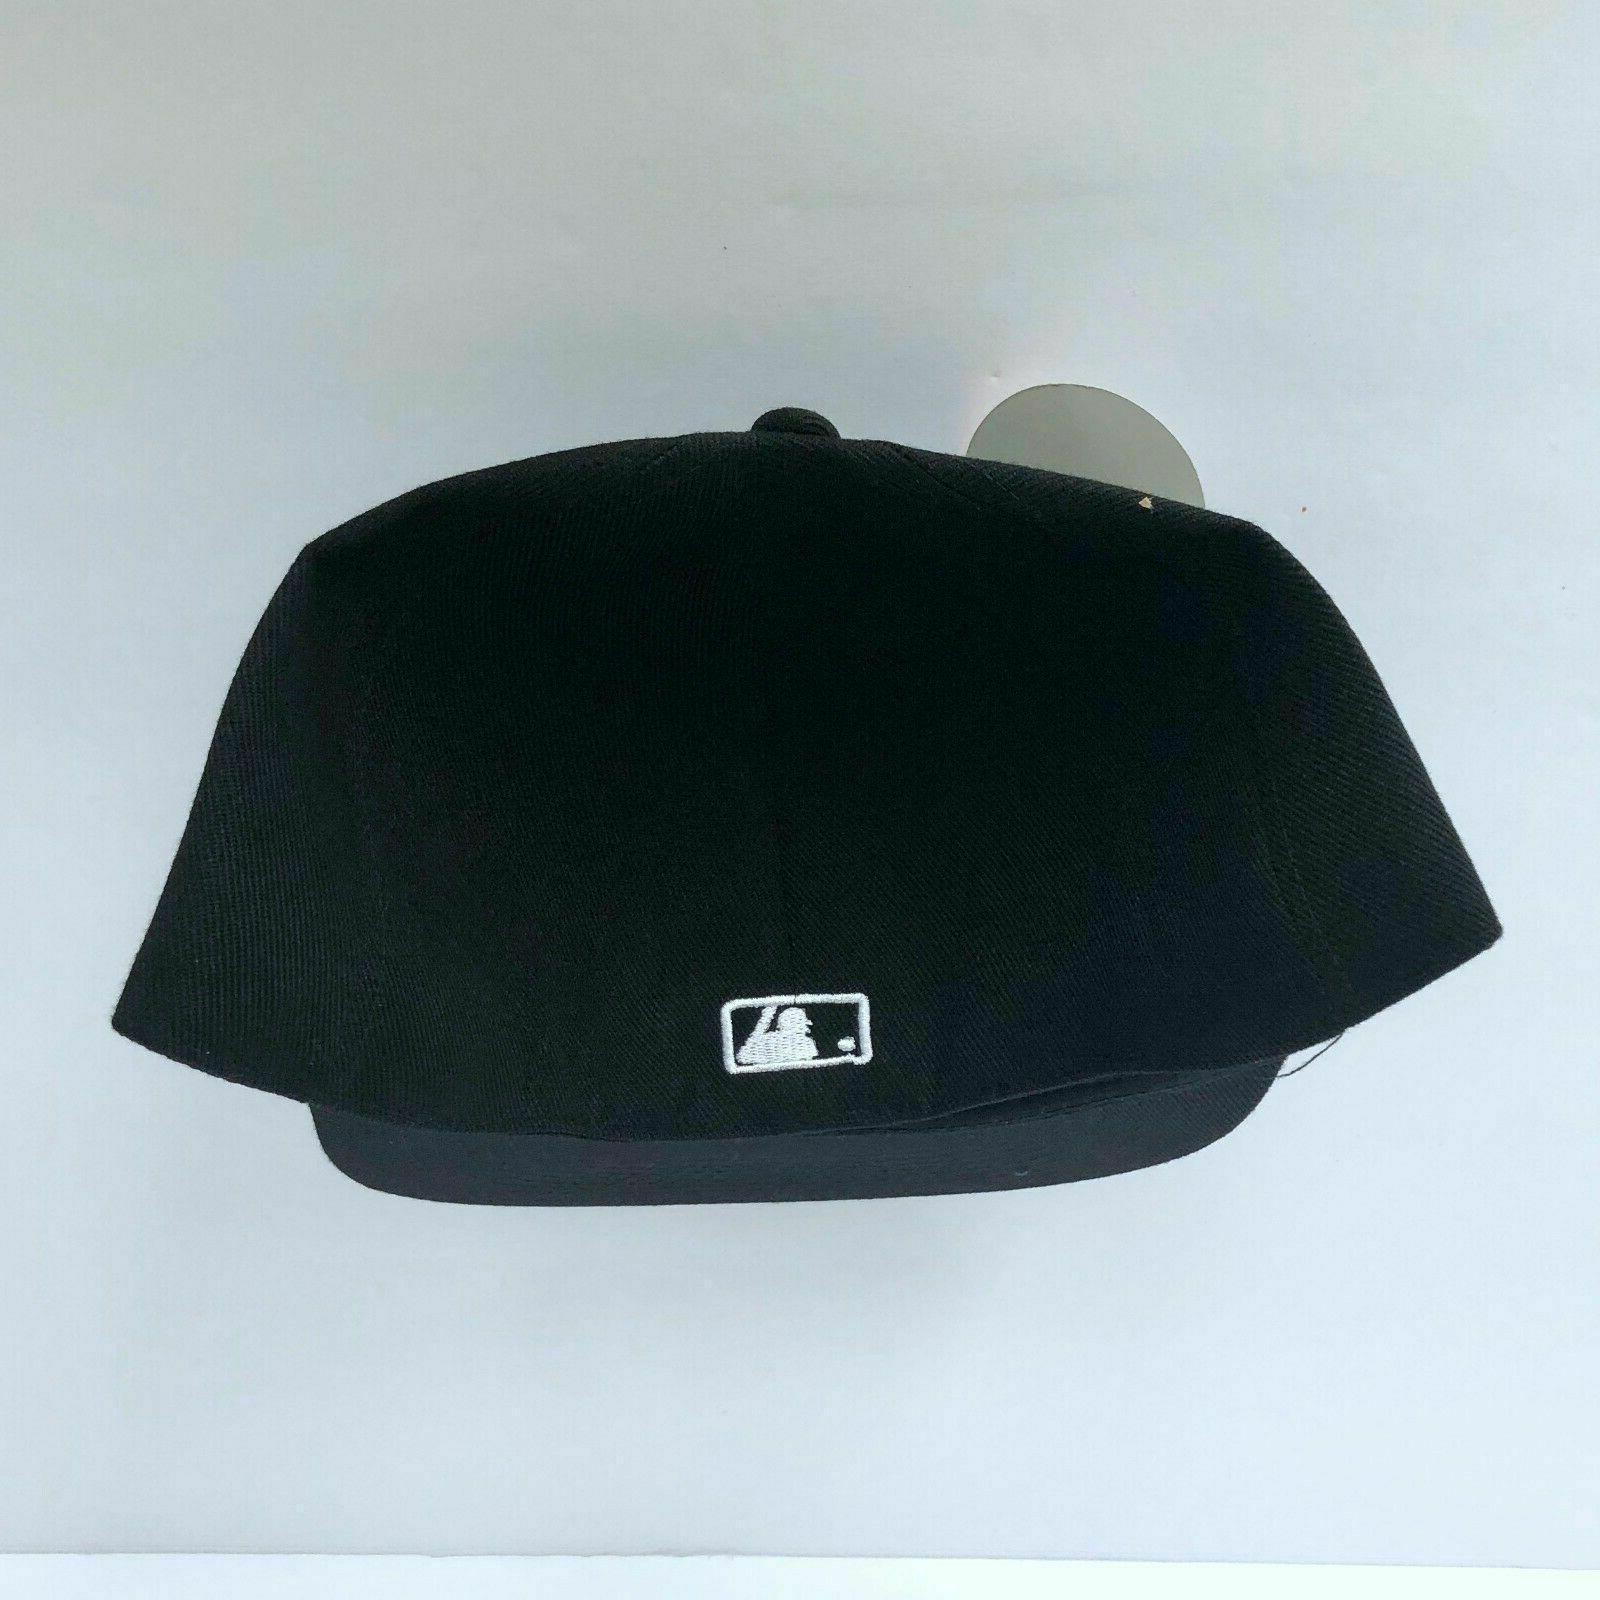 NEW Astros Baseball Fitted Multi Black